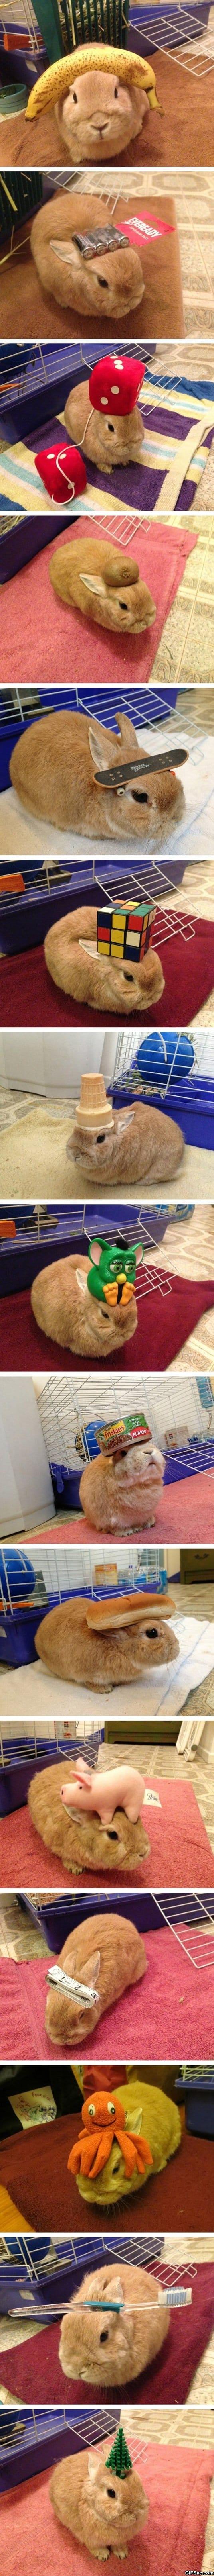 funny-stuff-on-my-rabbit